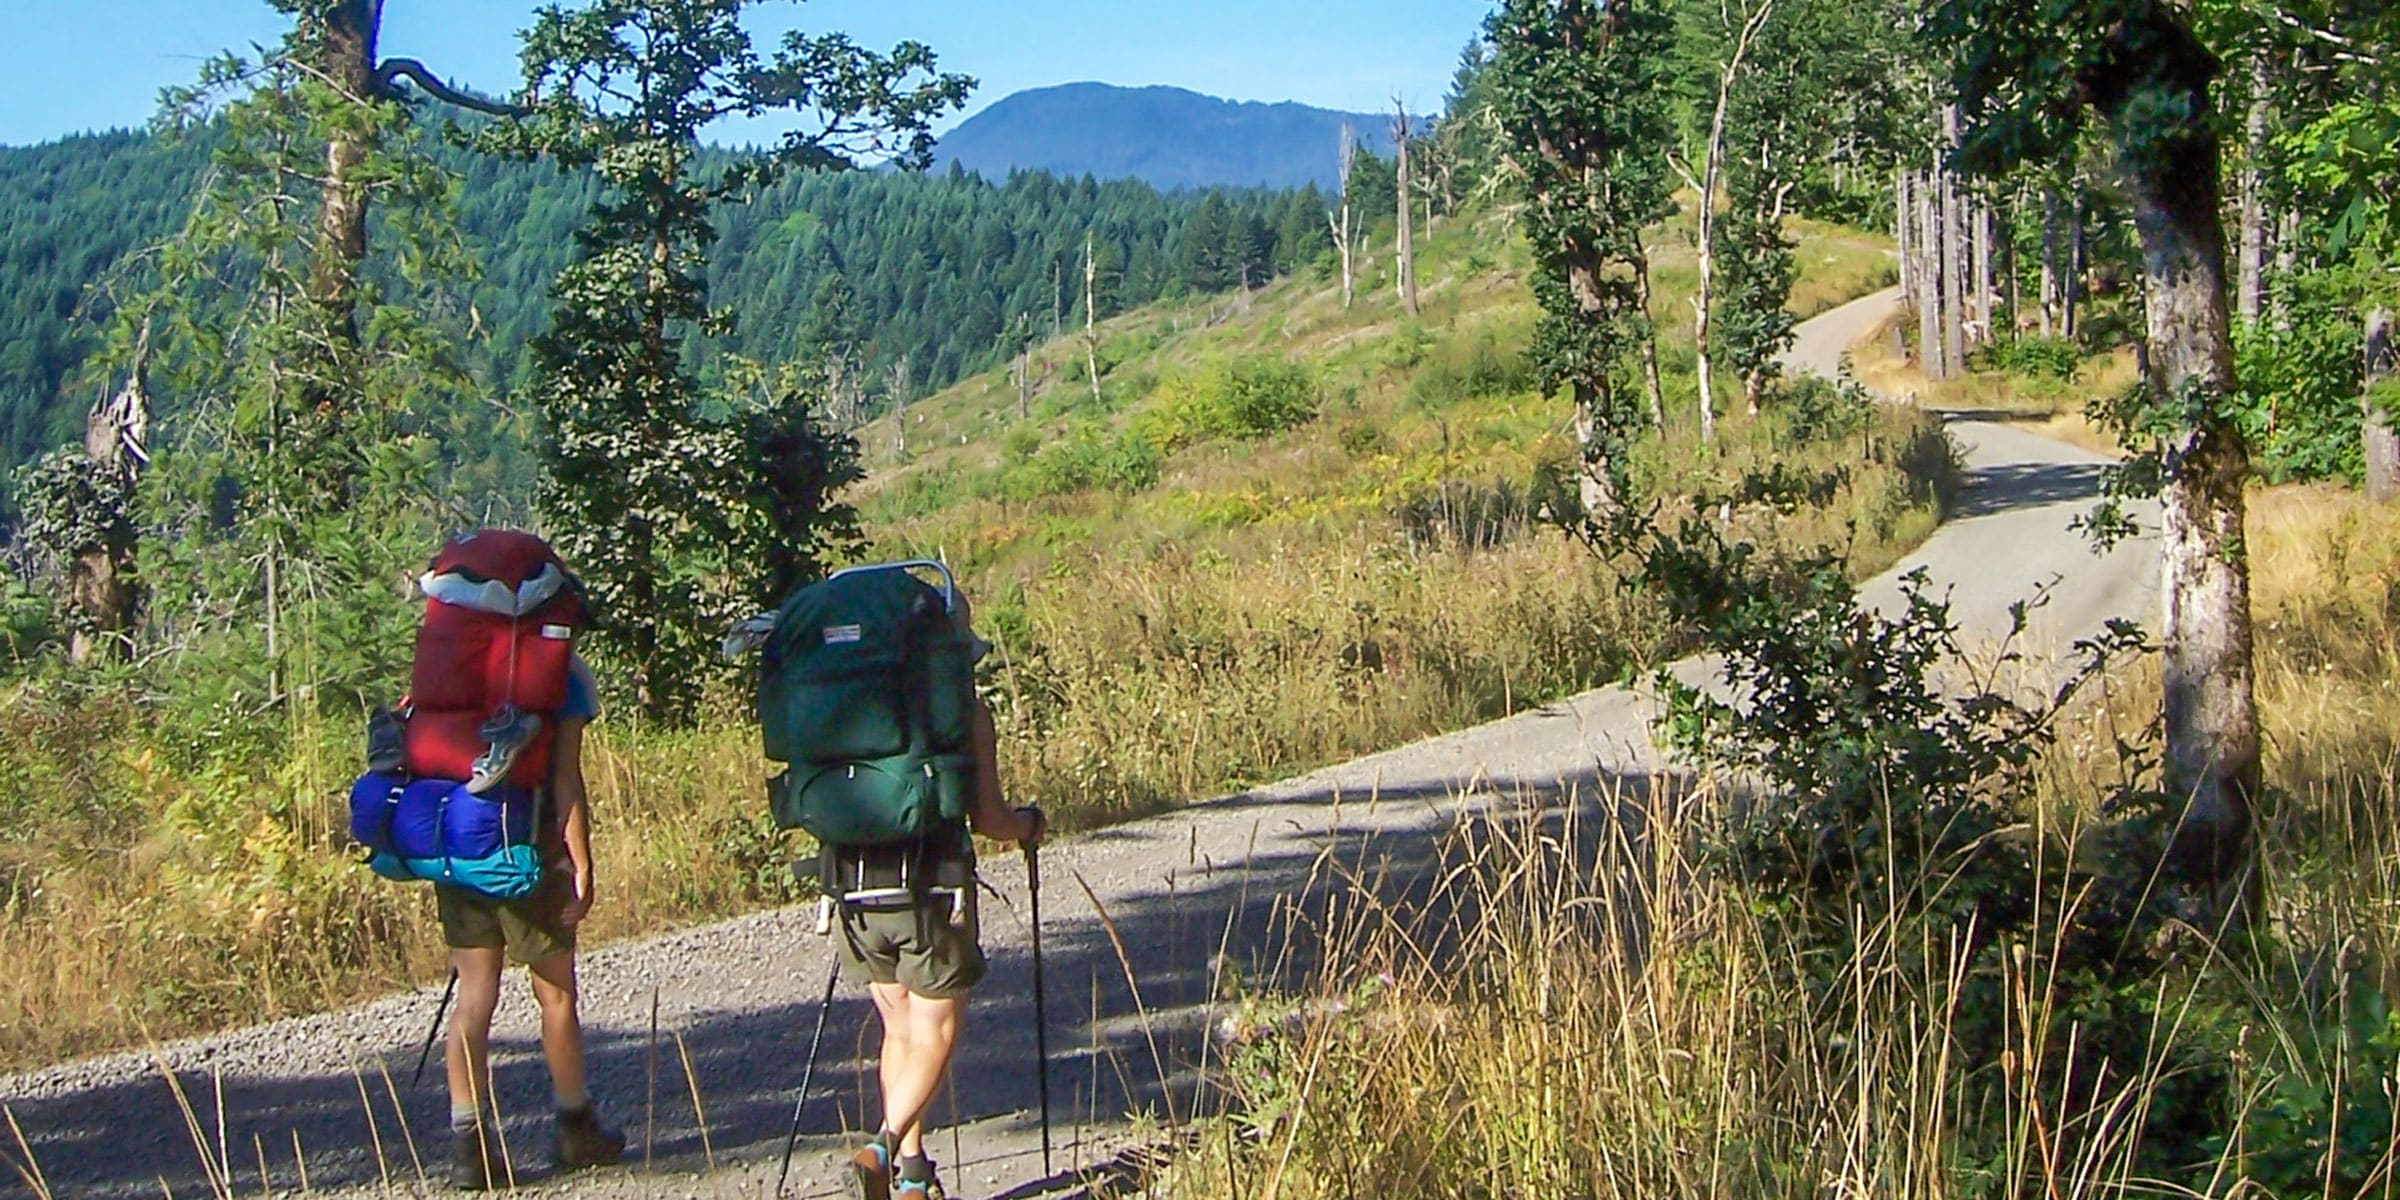 c2c Trail